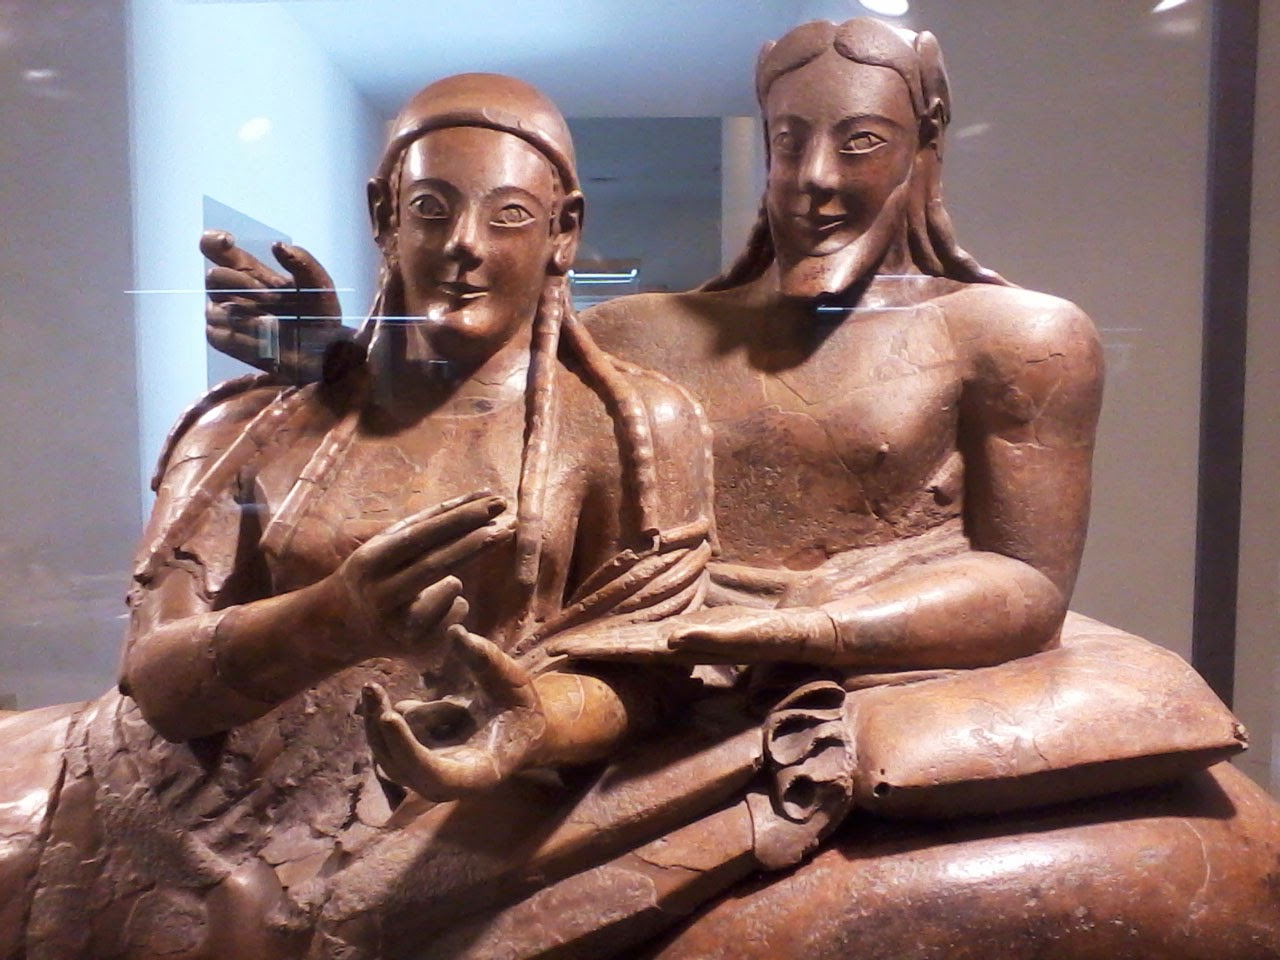 Seputura etrusca, Museu Etrusco de Roma